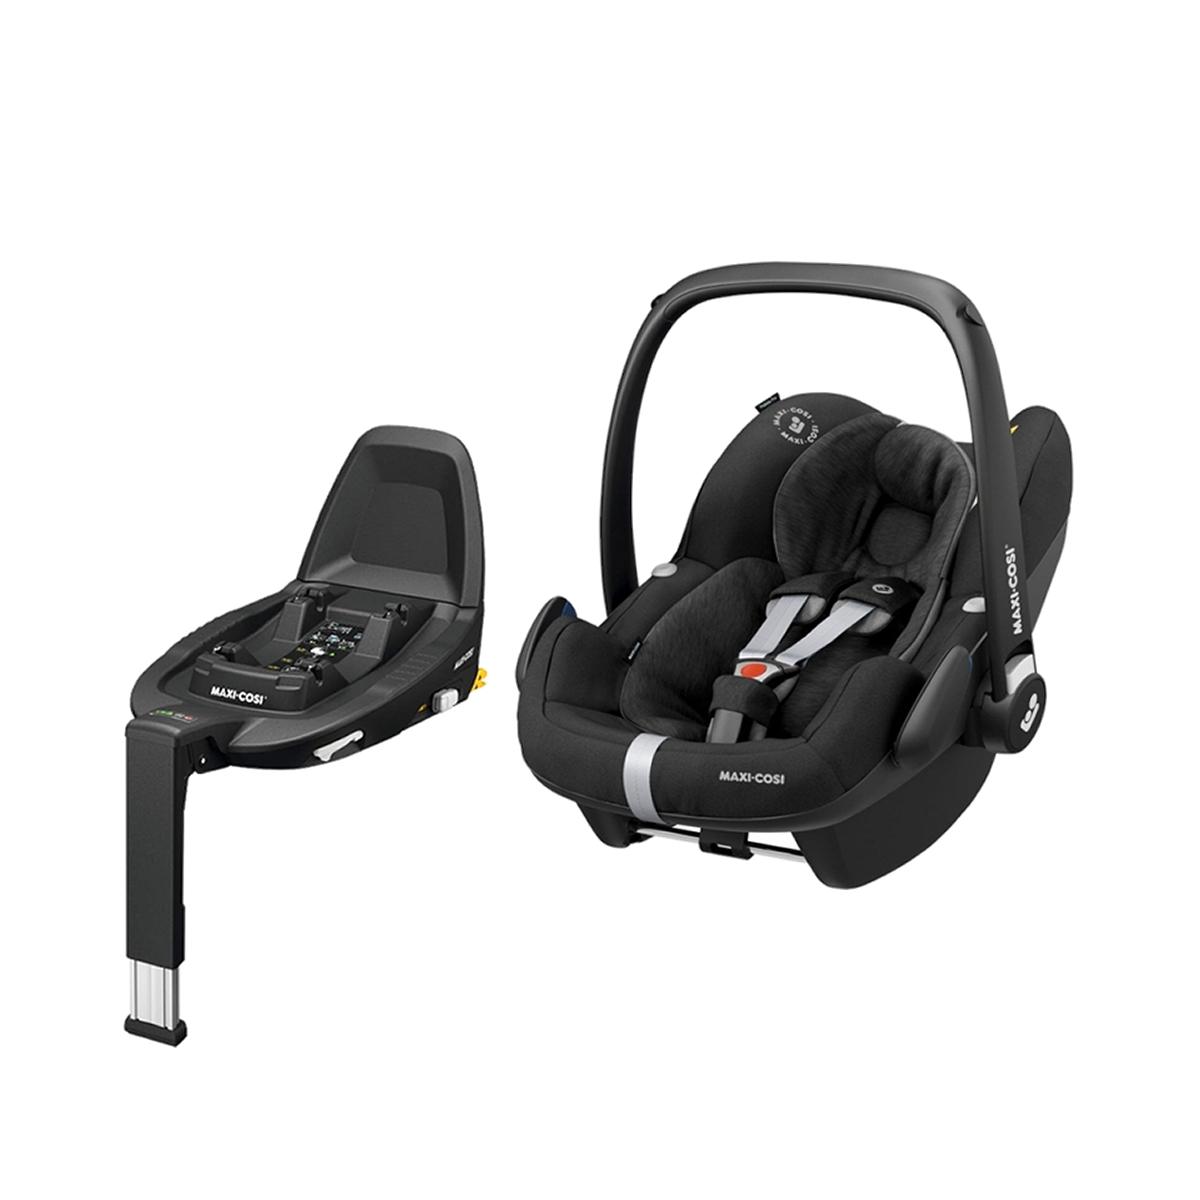 Maxi Cosi Pebble Pro Group 0+ Car Seat With FamilyFix3 Base Essential Black